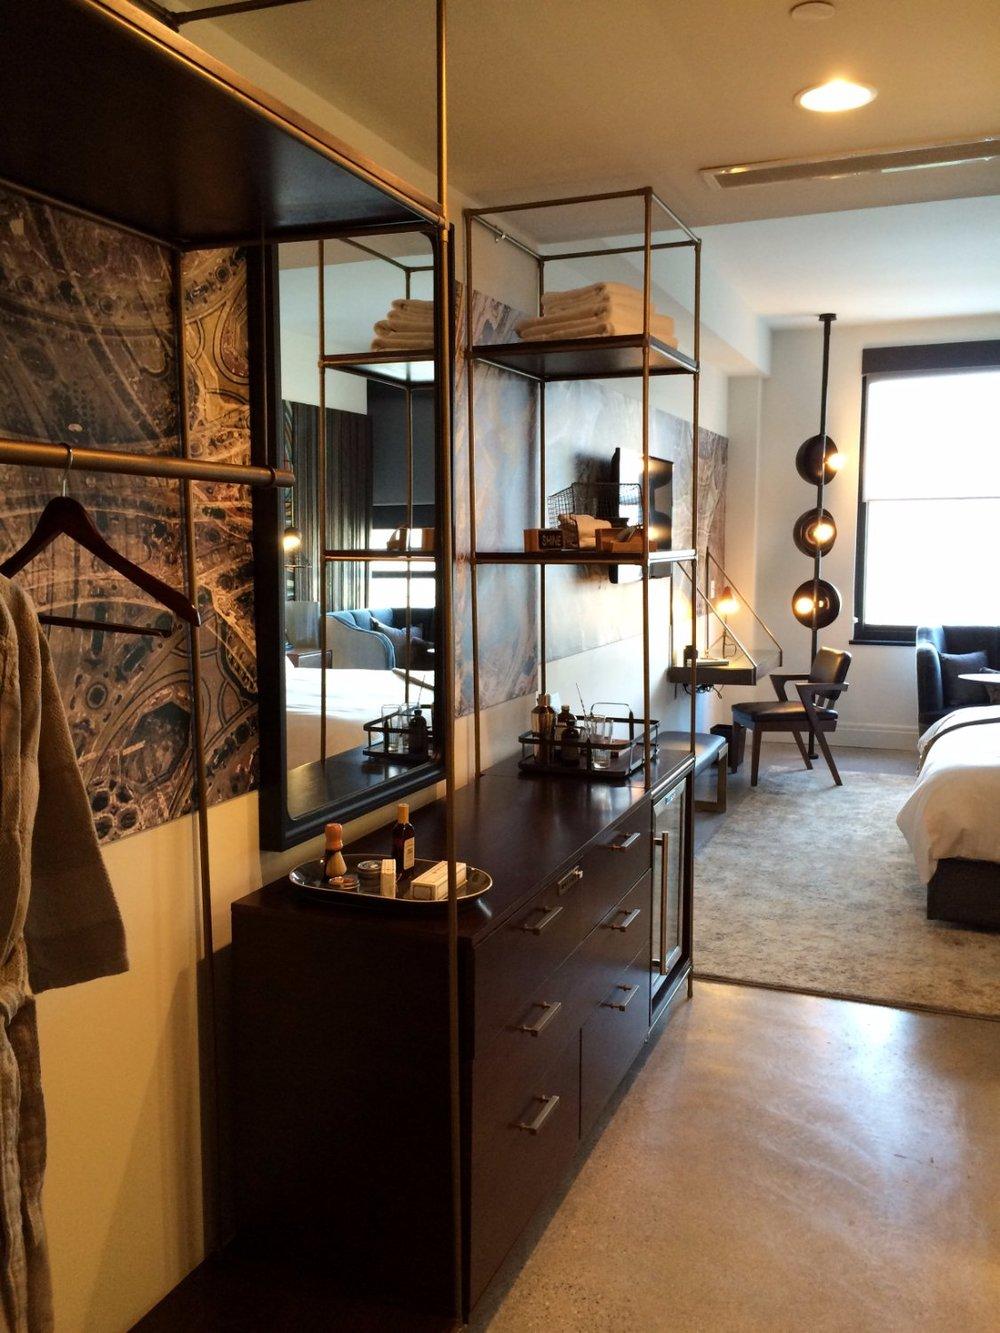 detroit-foundation-hotel-1.jpg